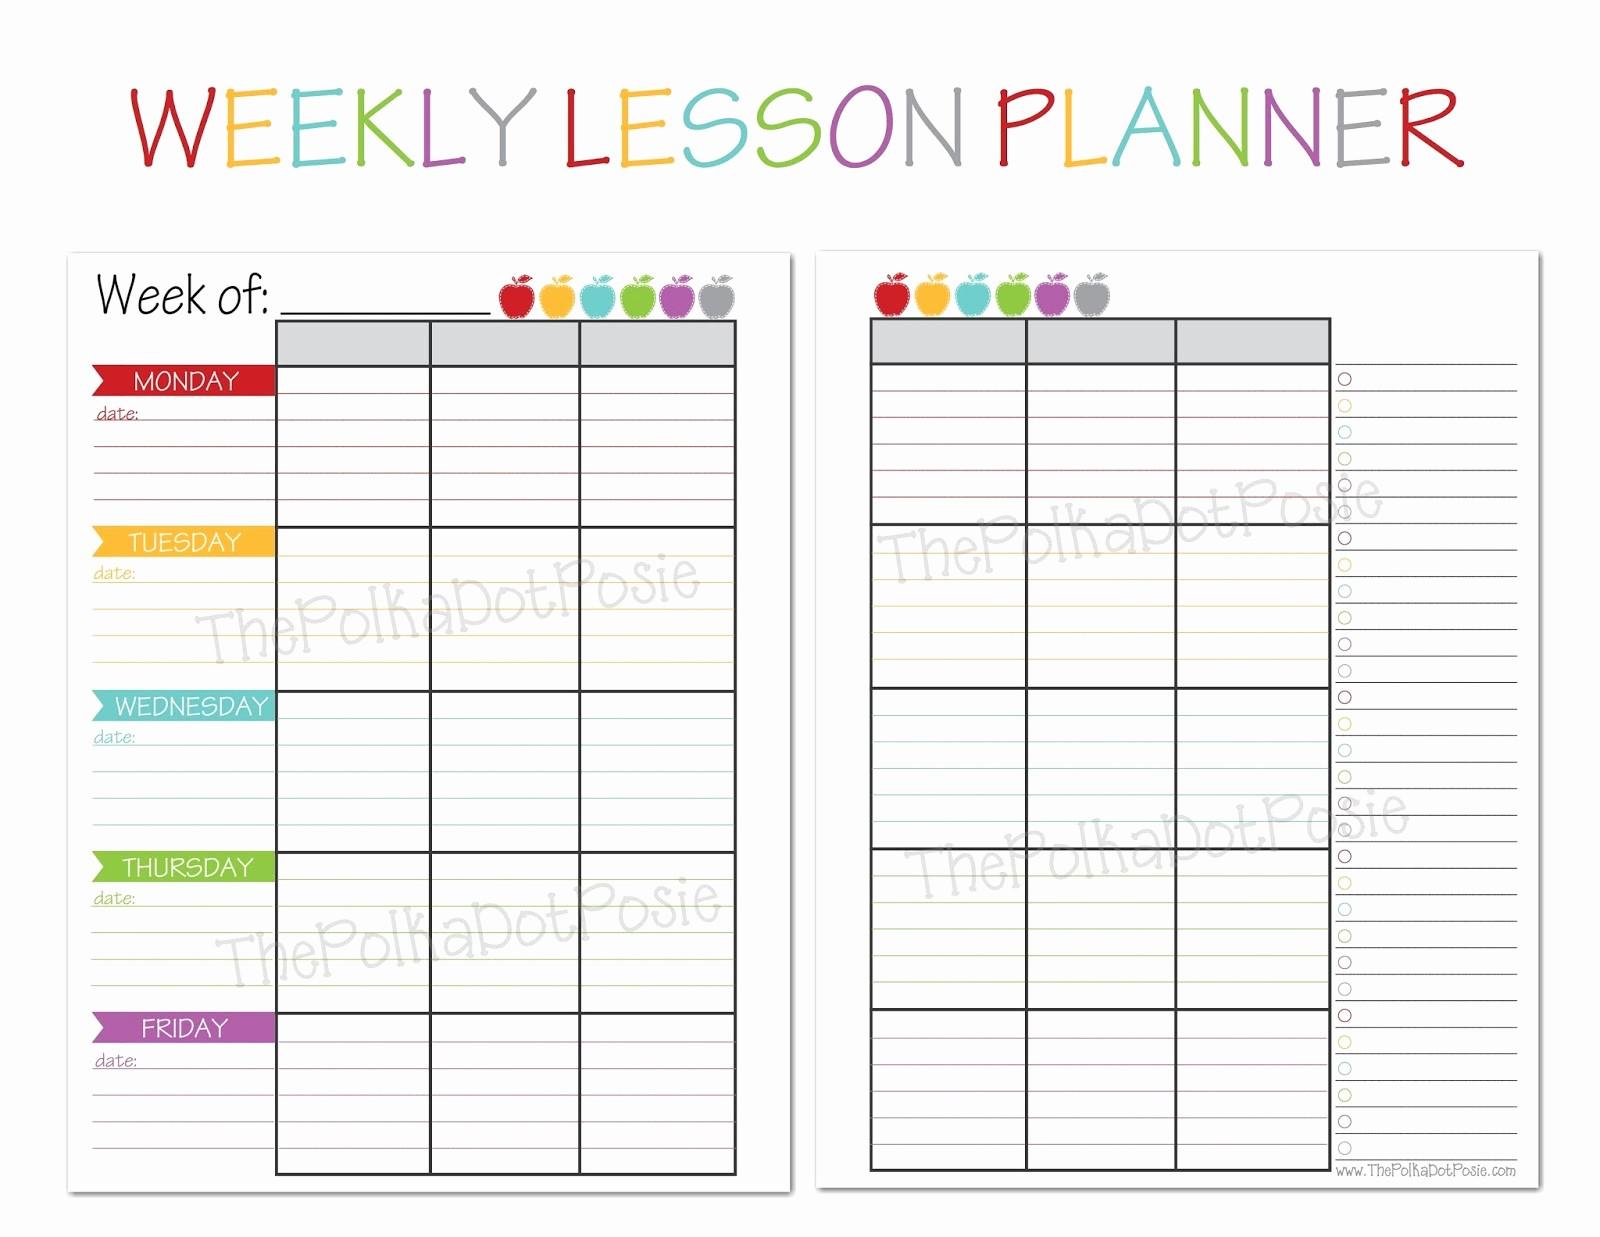 Teacher Weekly Planner Template Download Elegant the Polka Dot Posie New Teacher & Homeschool Planners